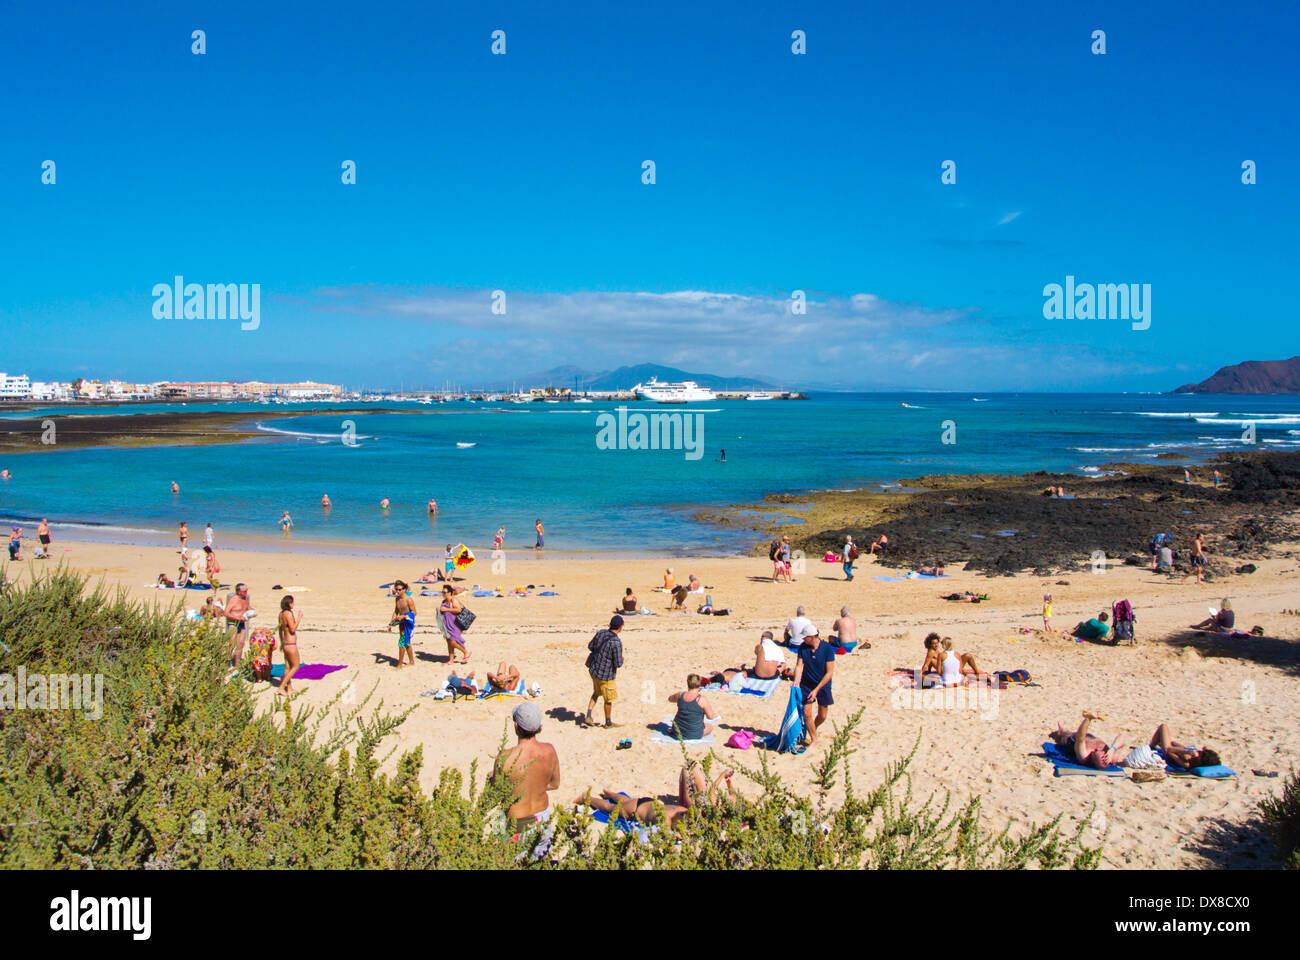 Strand Playa Corralejo Viejo, Corralejo, Fuerteventura, Kanarische Inseln, Spanien, Europa Stockbild